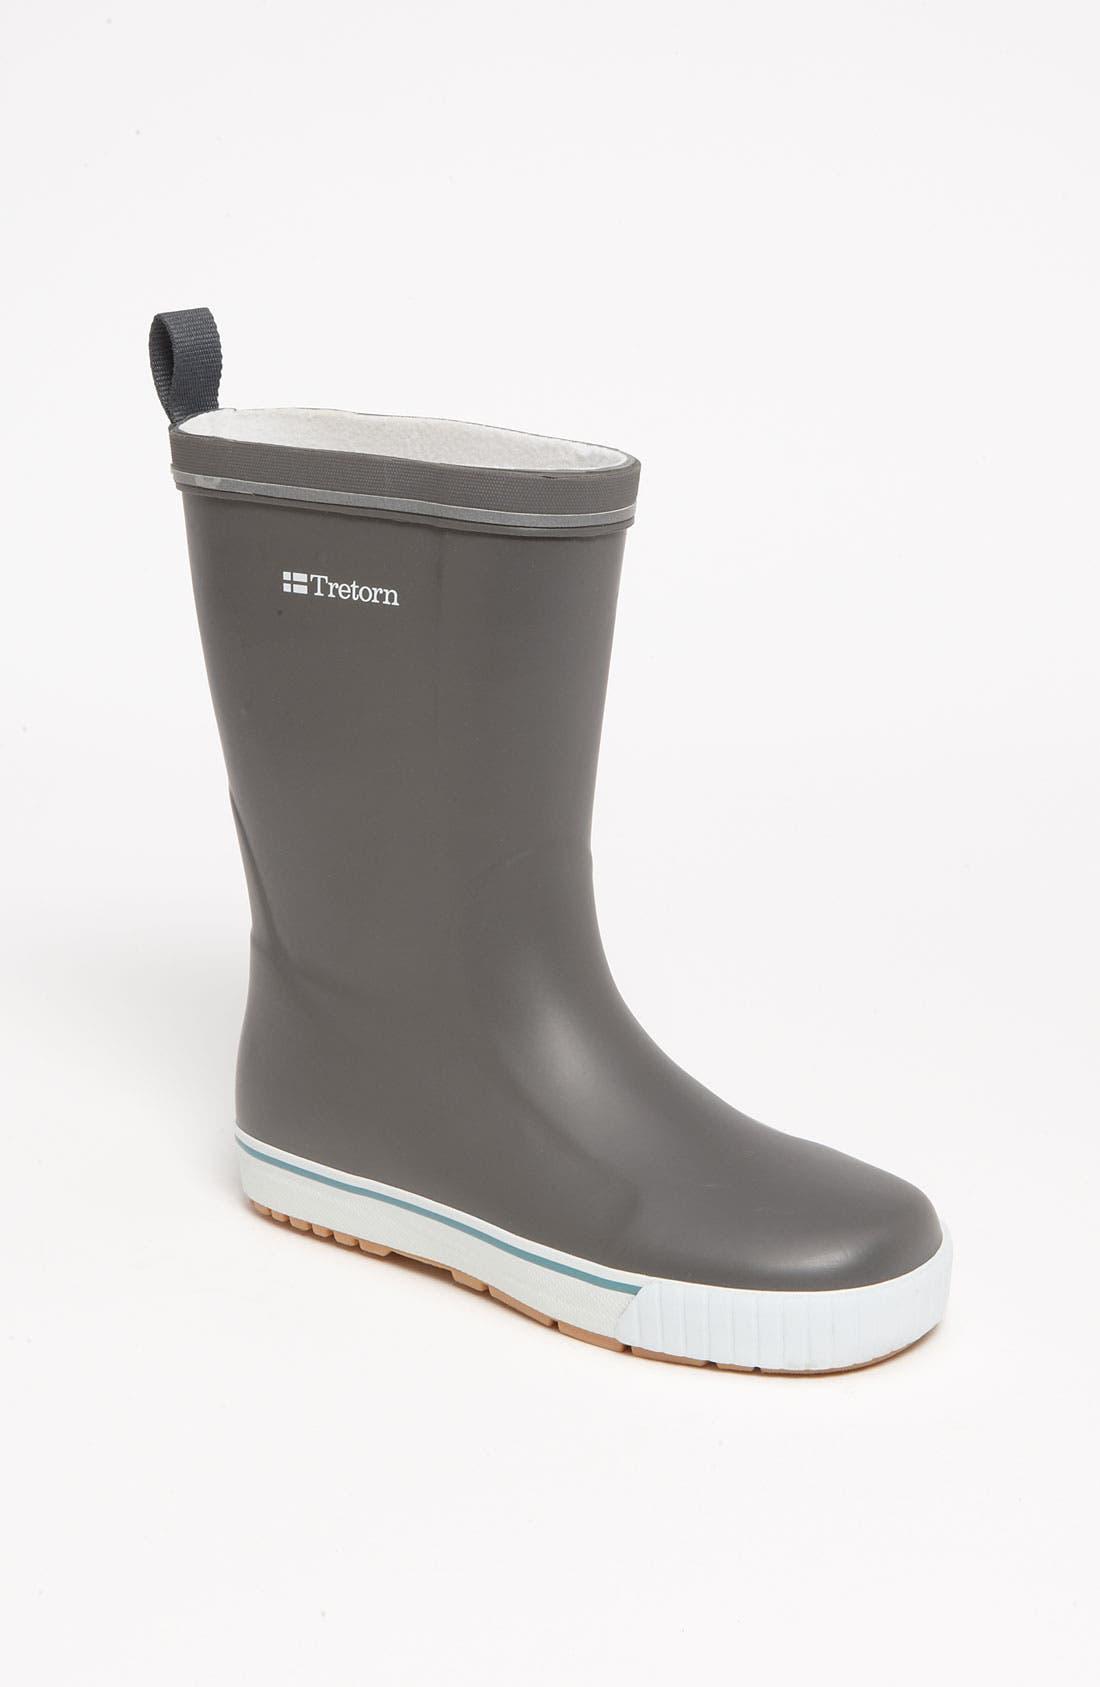 TRETORN 'Skerry' Rain Boot, Main, color, 020